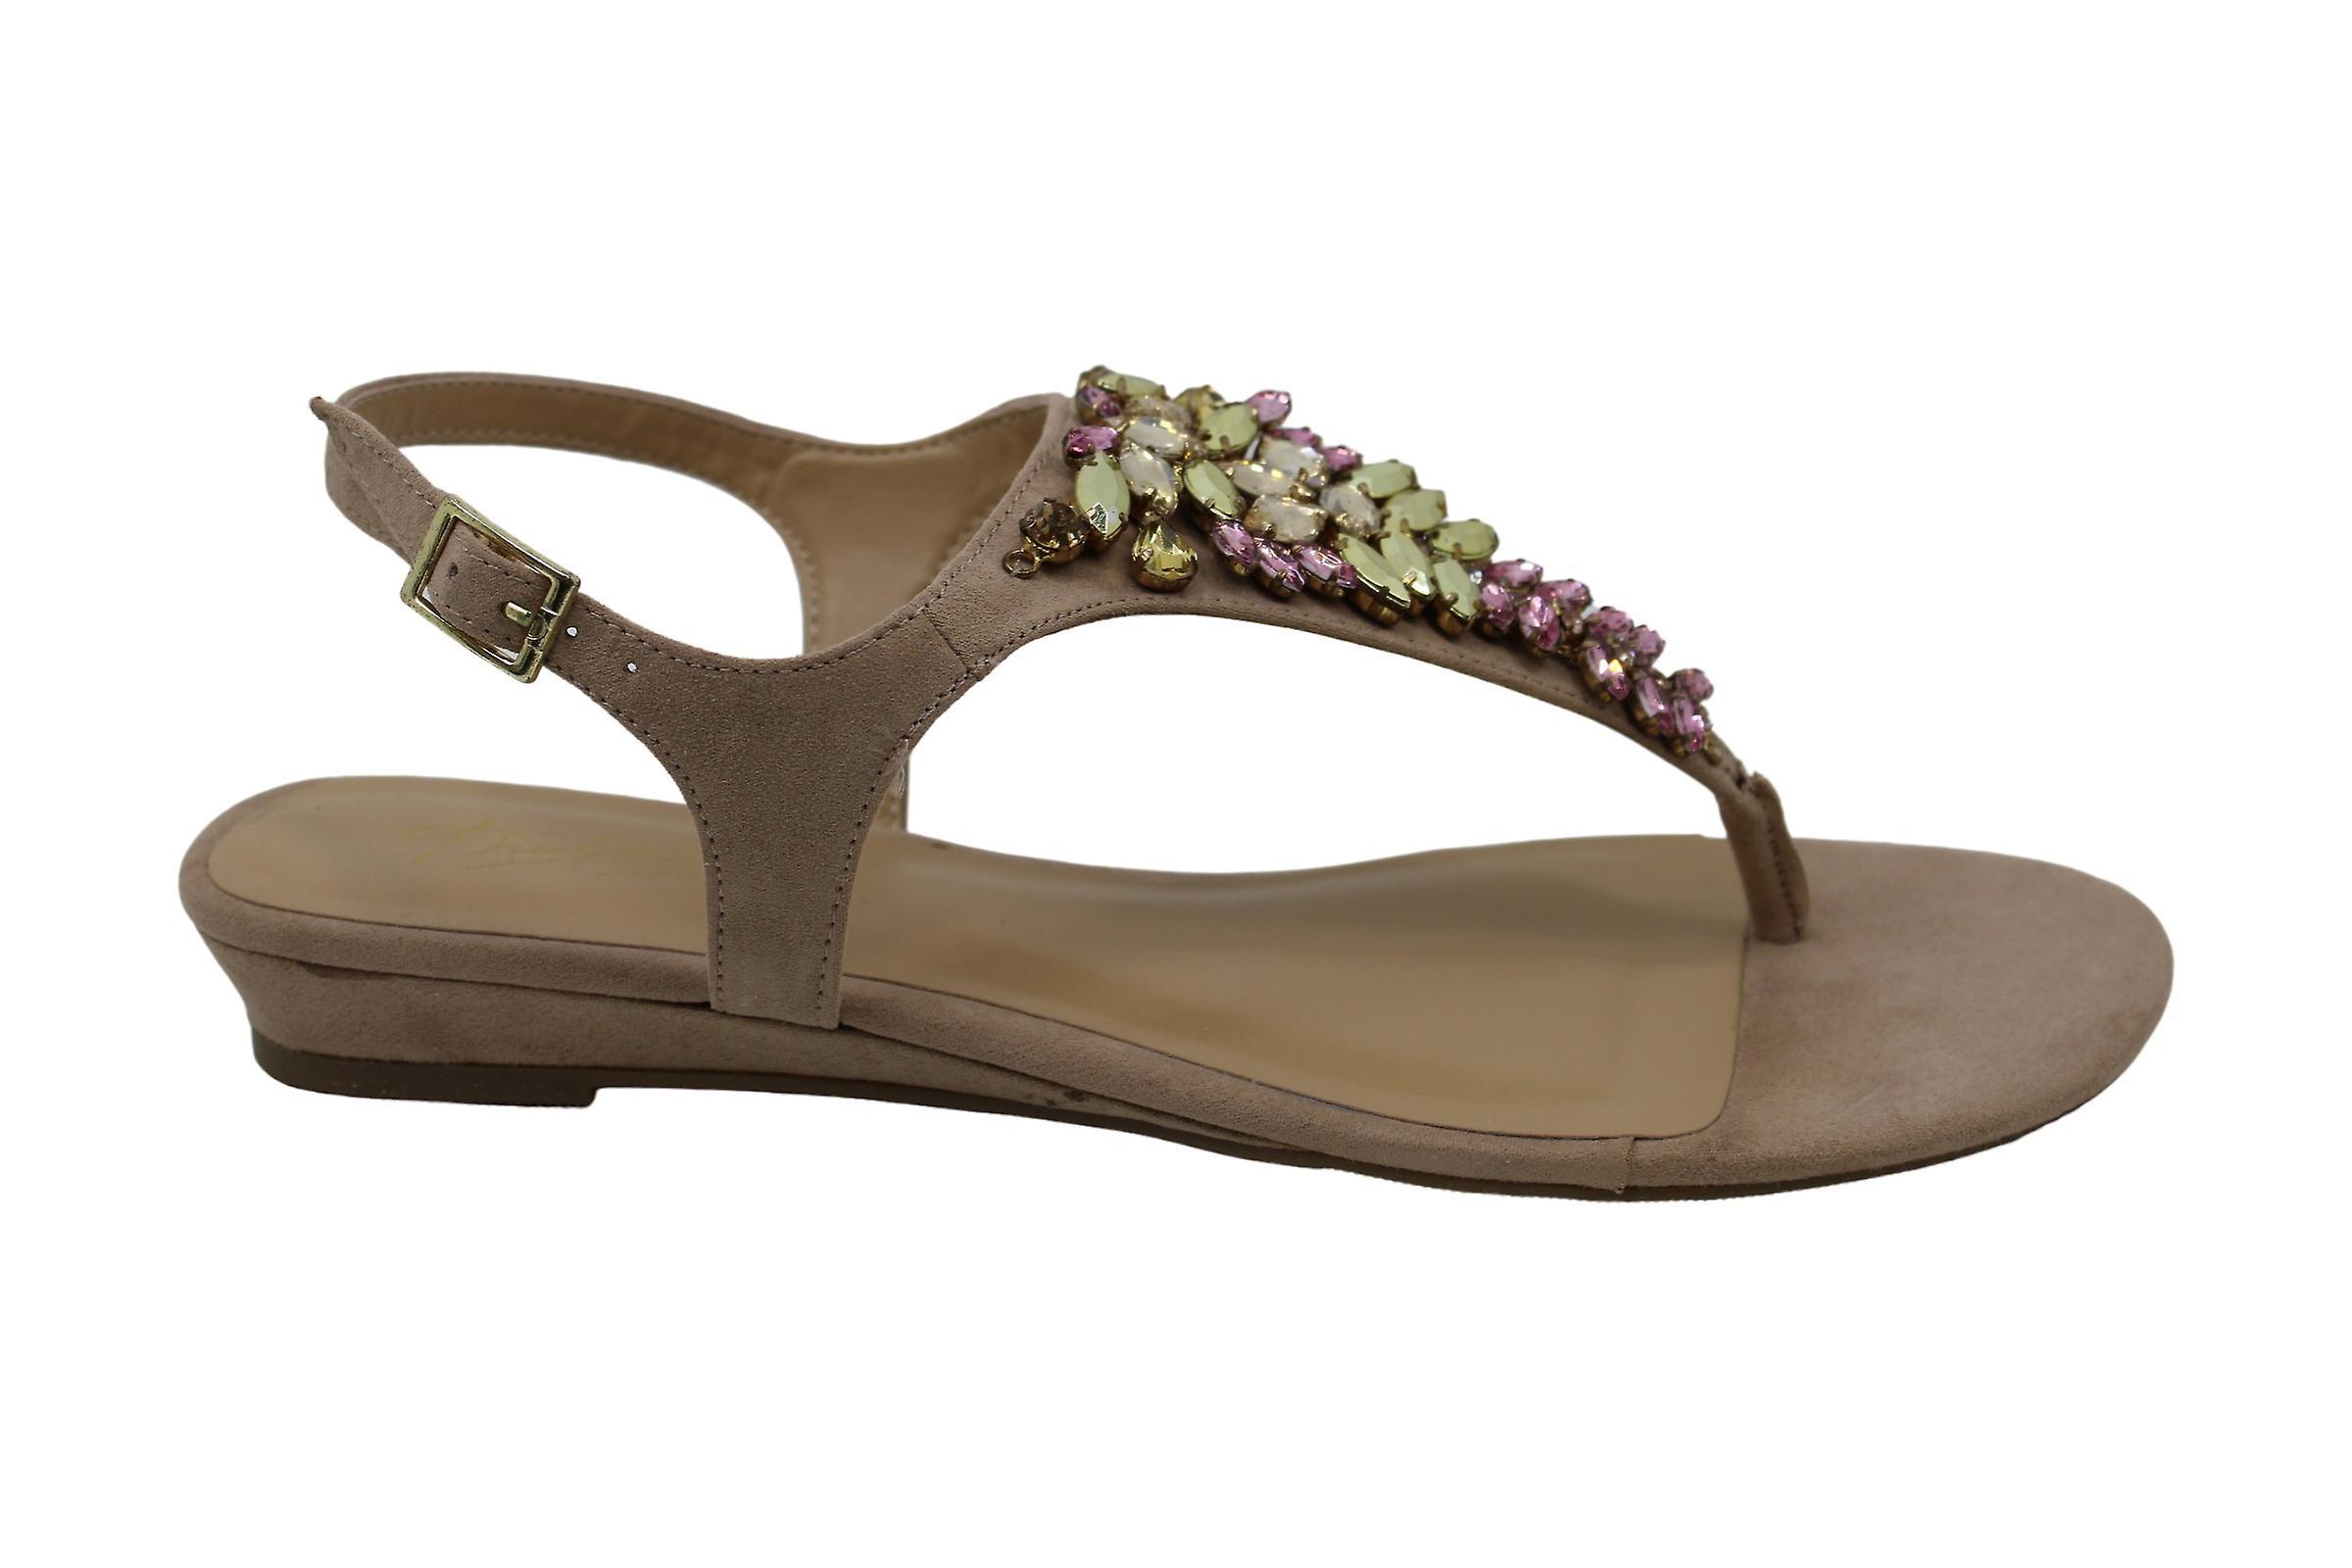 Thalia Sodi Womens FUERTO Split Toe Casual Gladiator Sandals E86sw